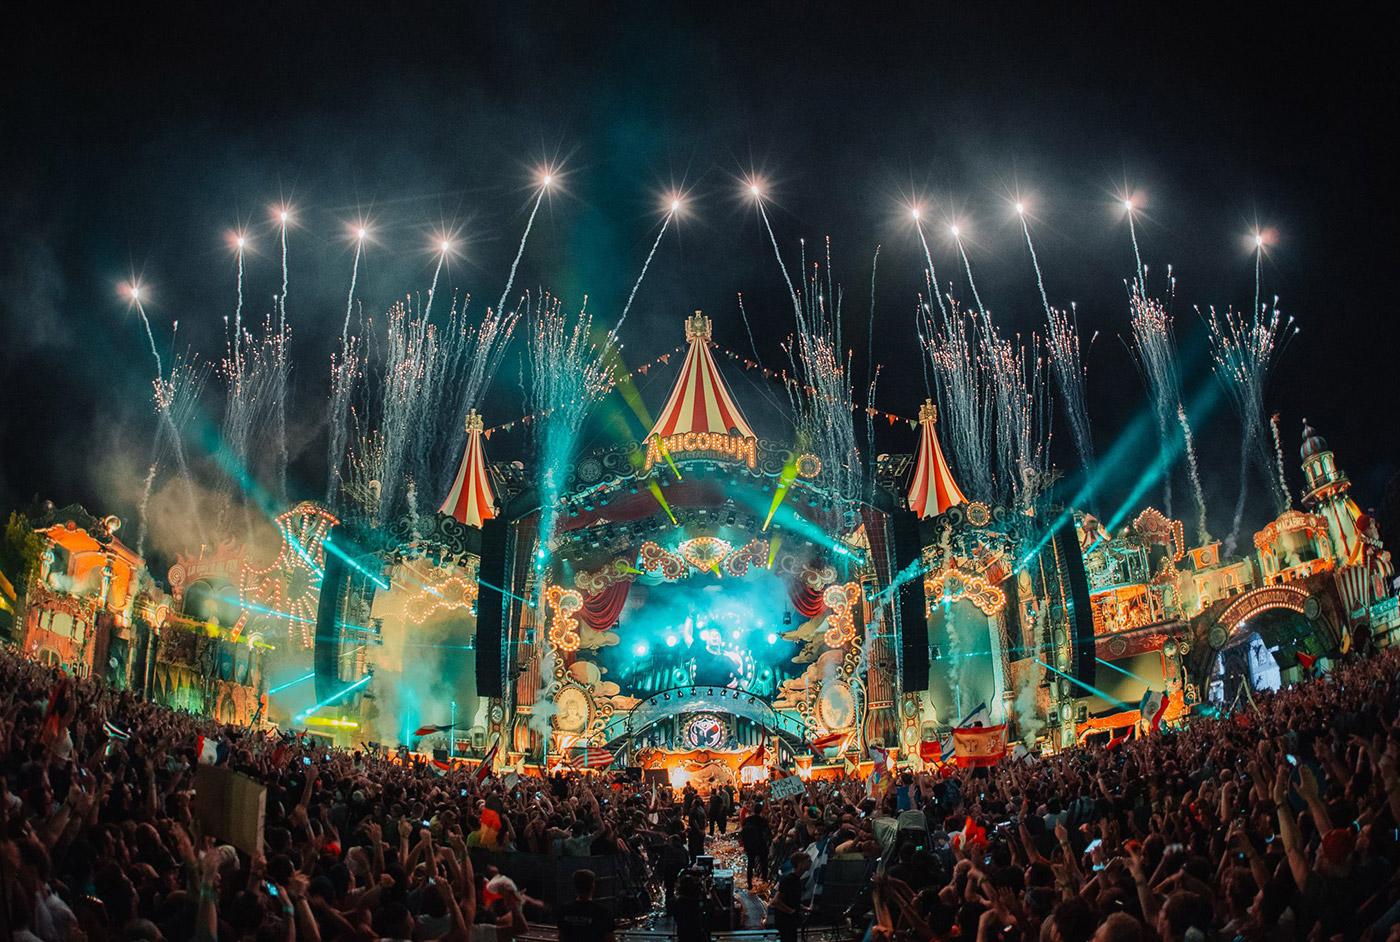 TomorrowlandMainStage_2017_1_tn4WgUp.jpg